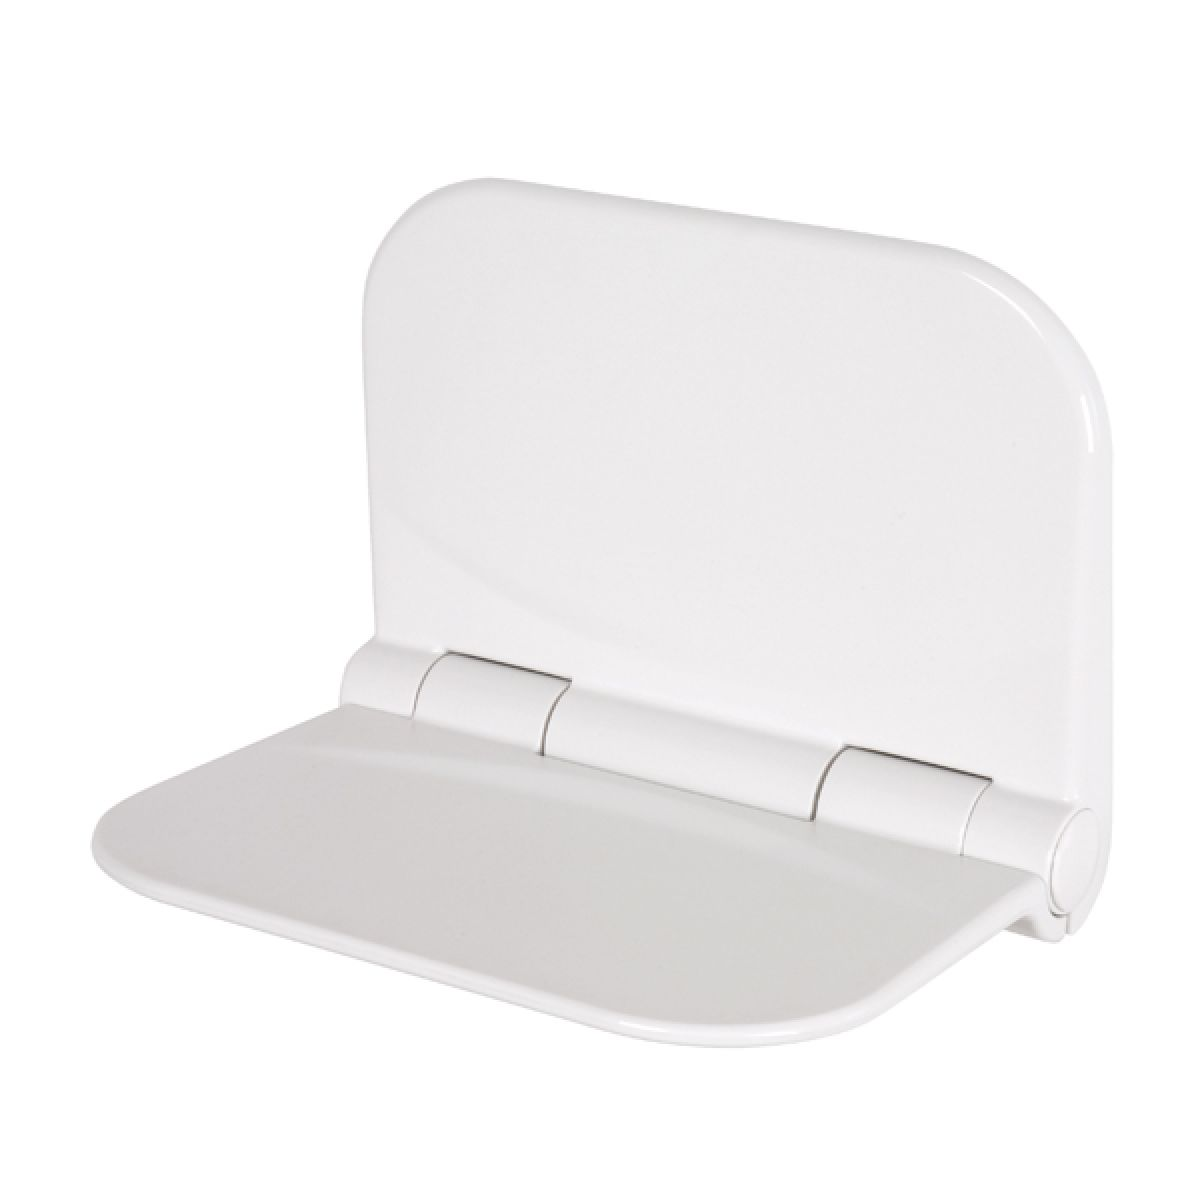 Frontline Aqua Shower Seat